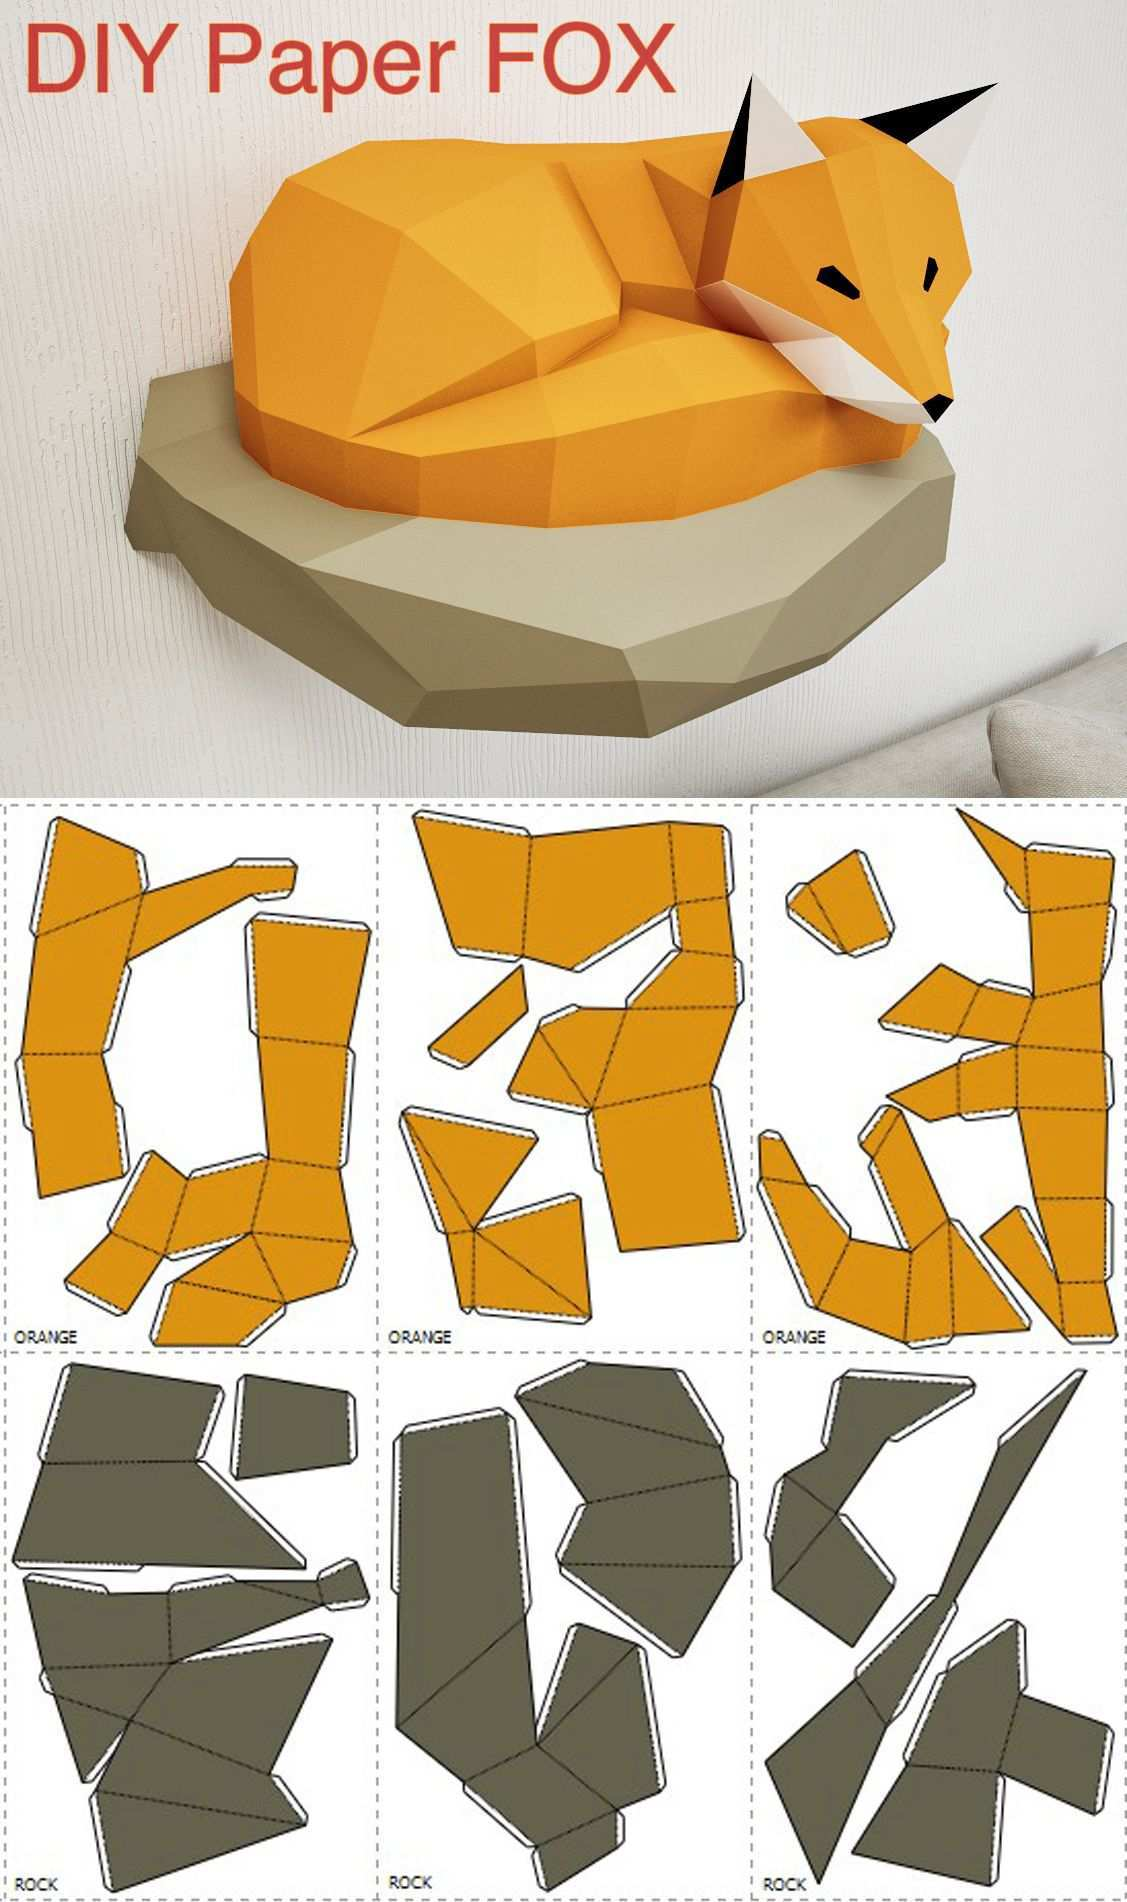 Papercraft Fox On Rock Paper Model 3d Paper Craft Paper Etsy Paper Animals 3d Paper Crafts Paper Crafts